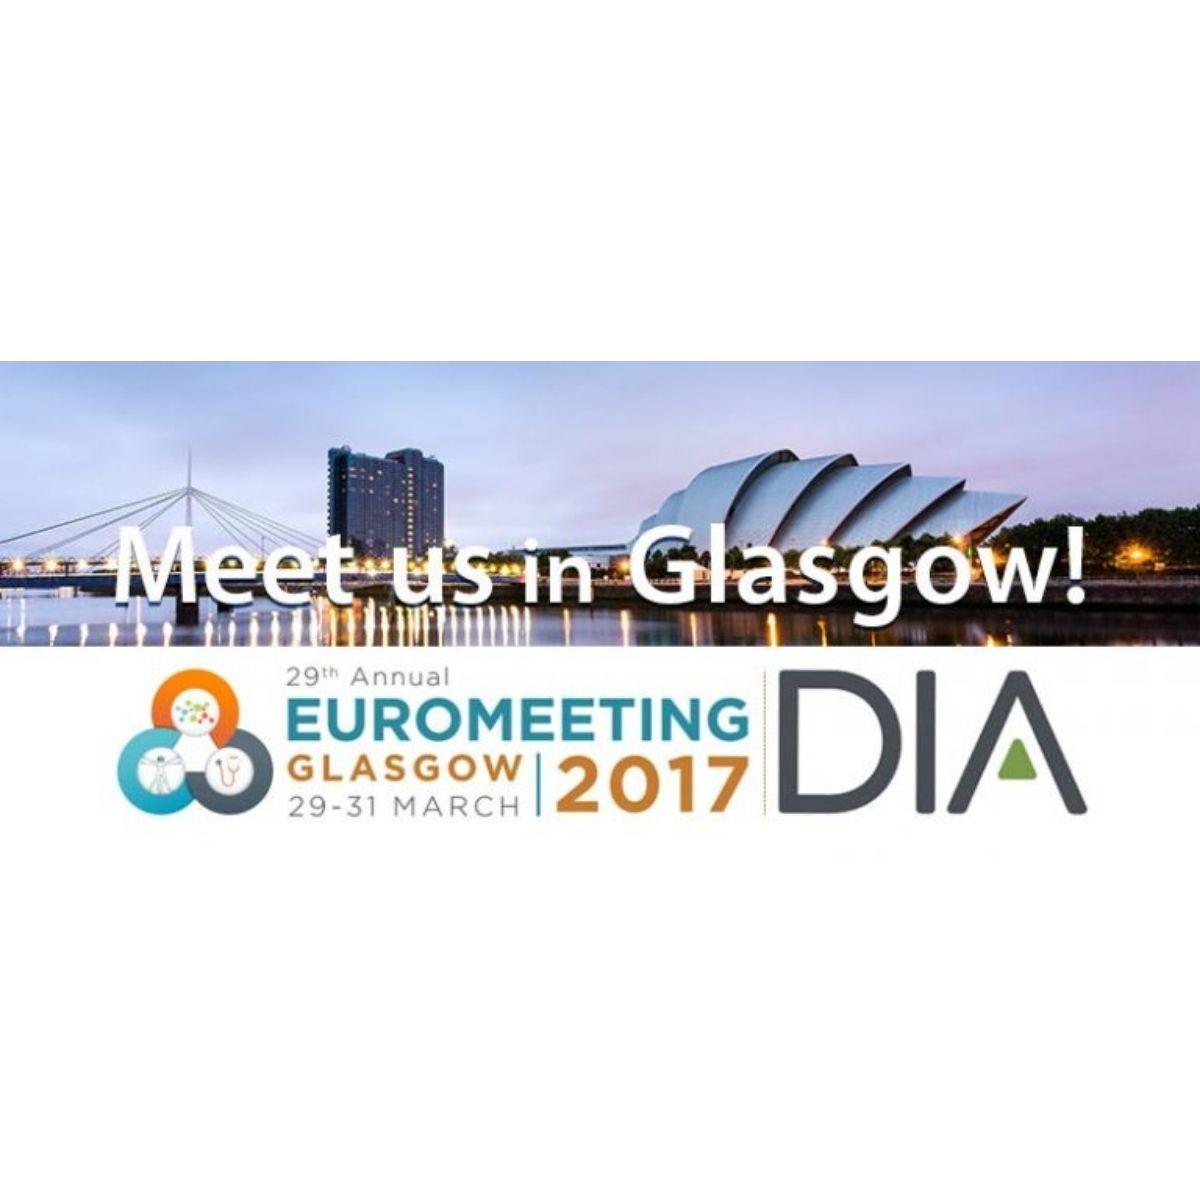 Meet us at DIA Euromeeting 2017!